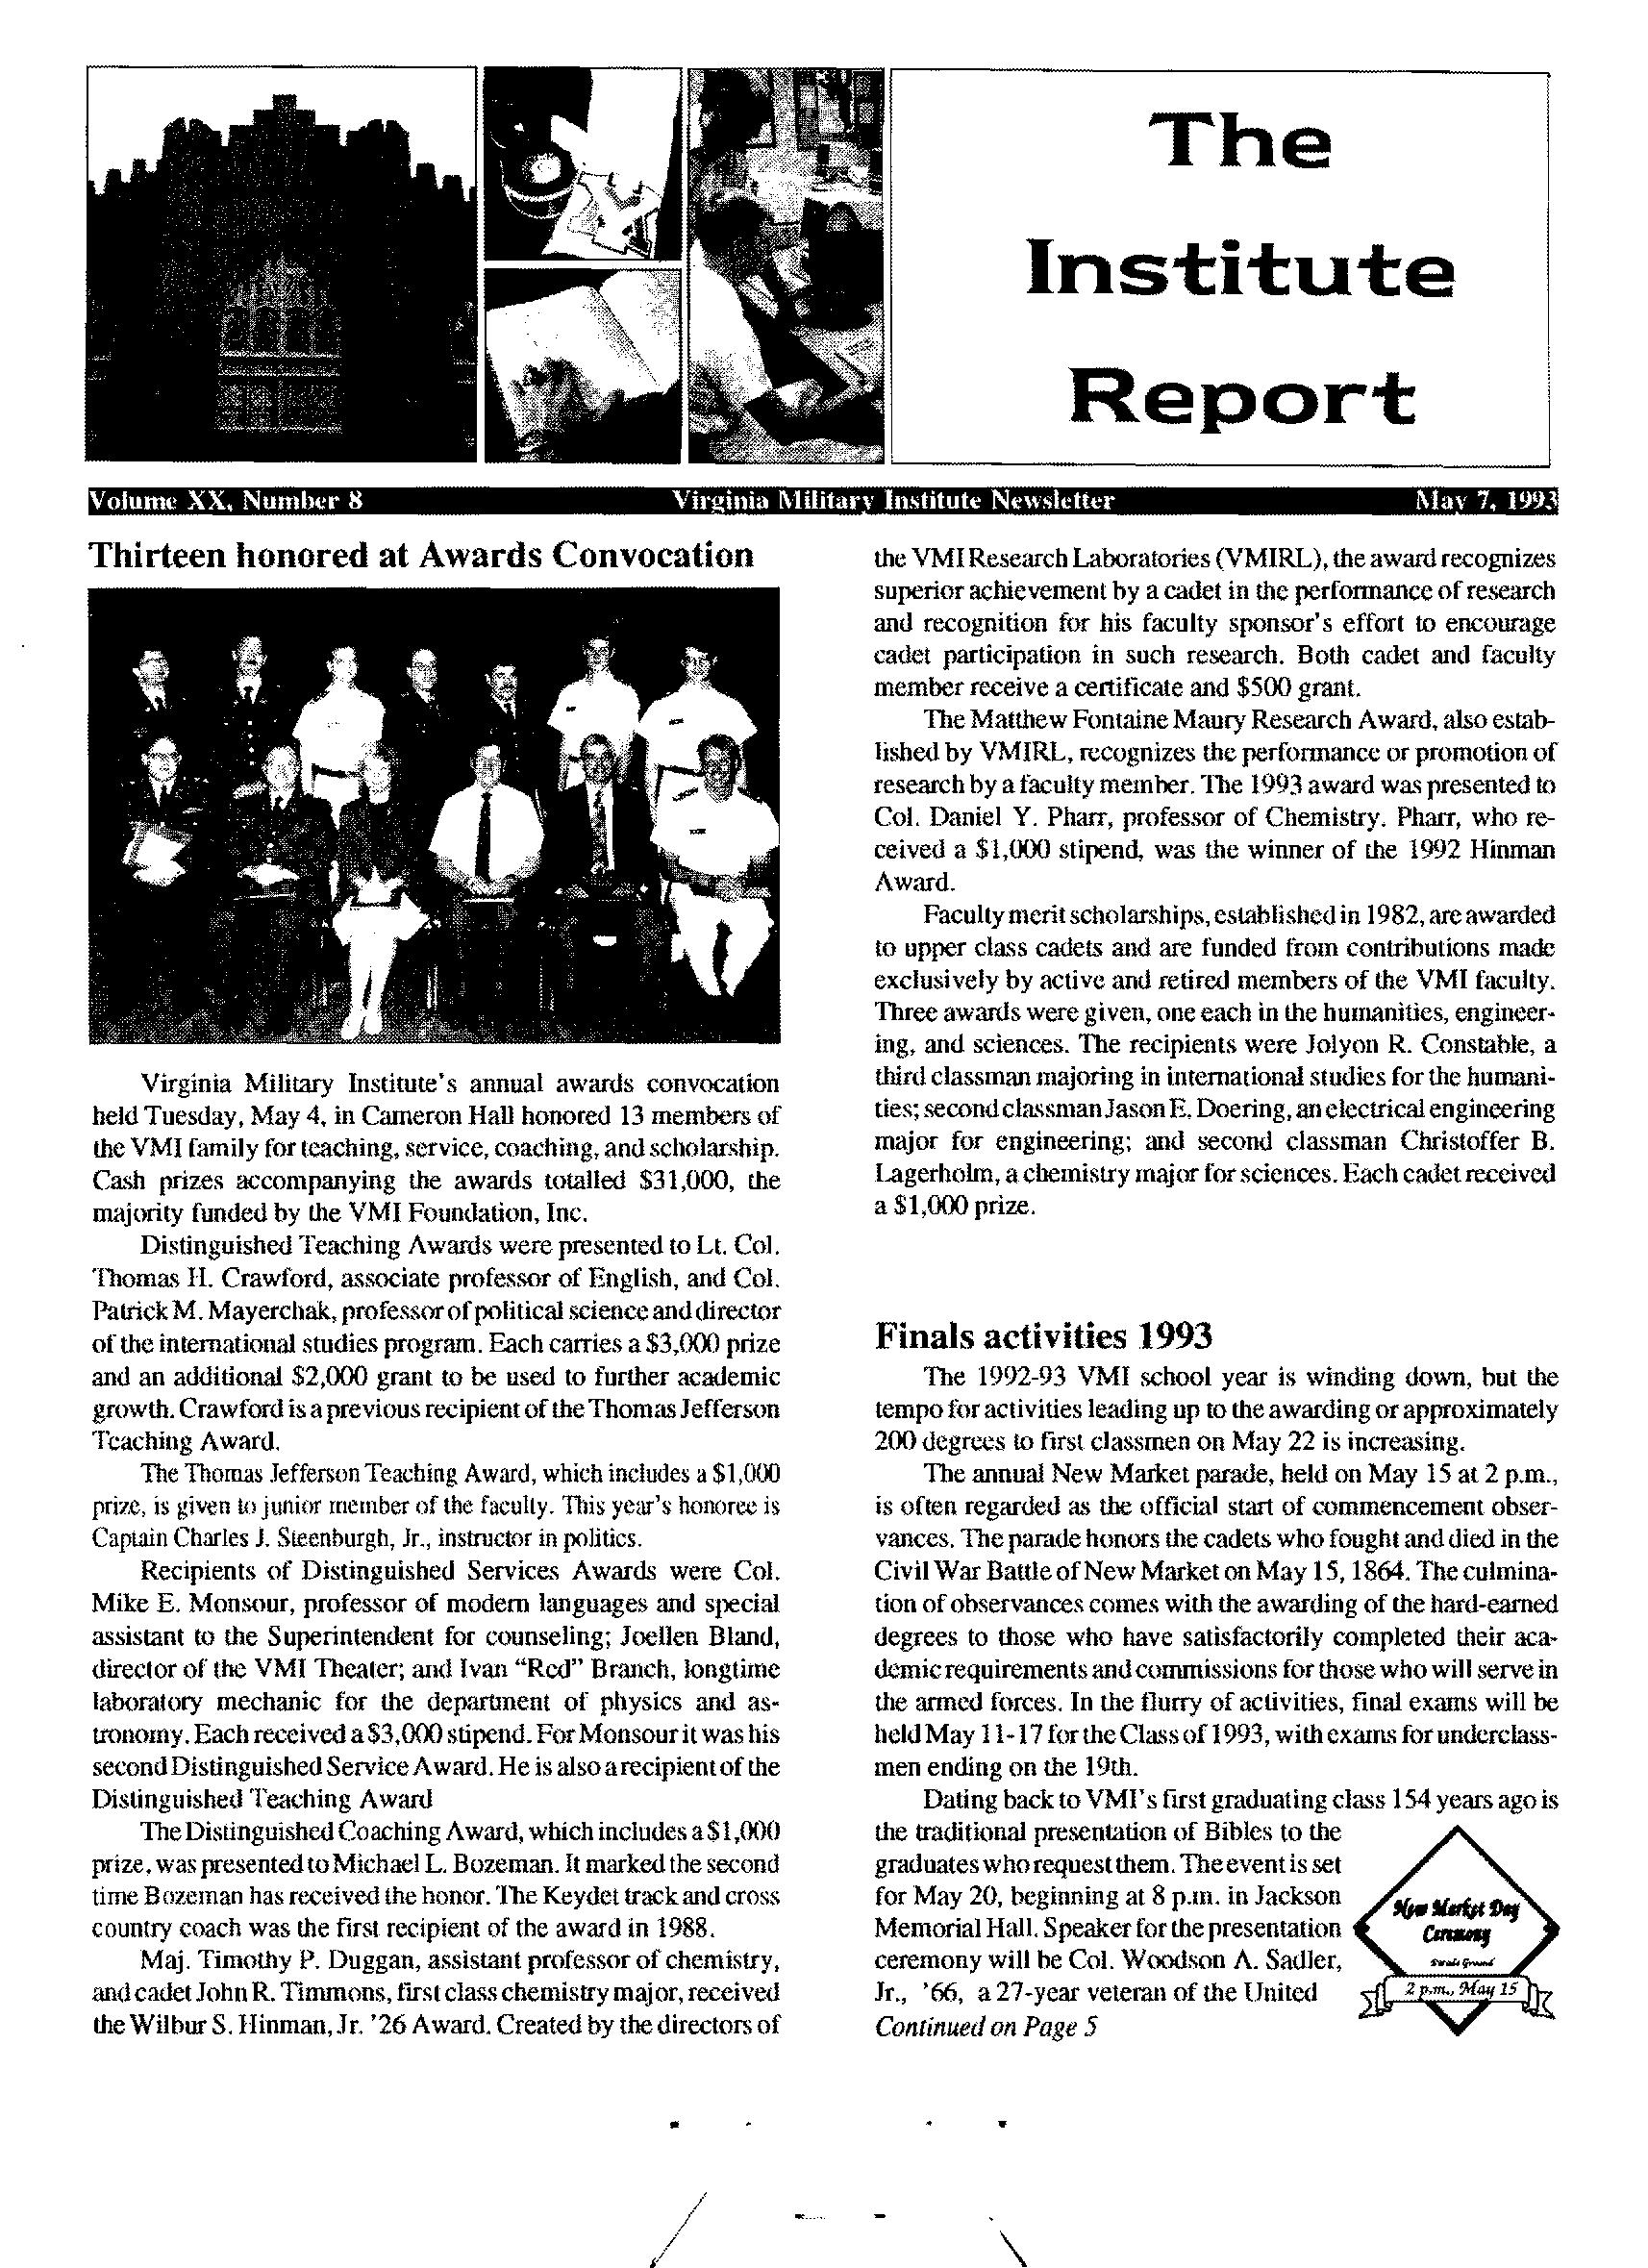 Institute Report May 7 1993 Vmi Publications Digital Archives Vmi Archives Digital Collections